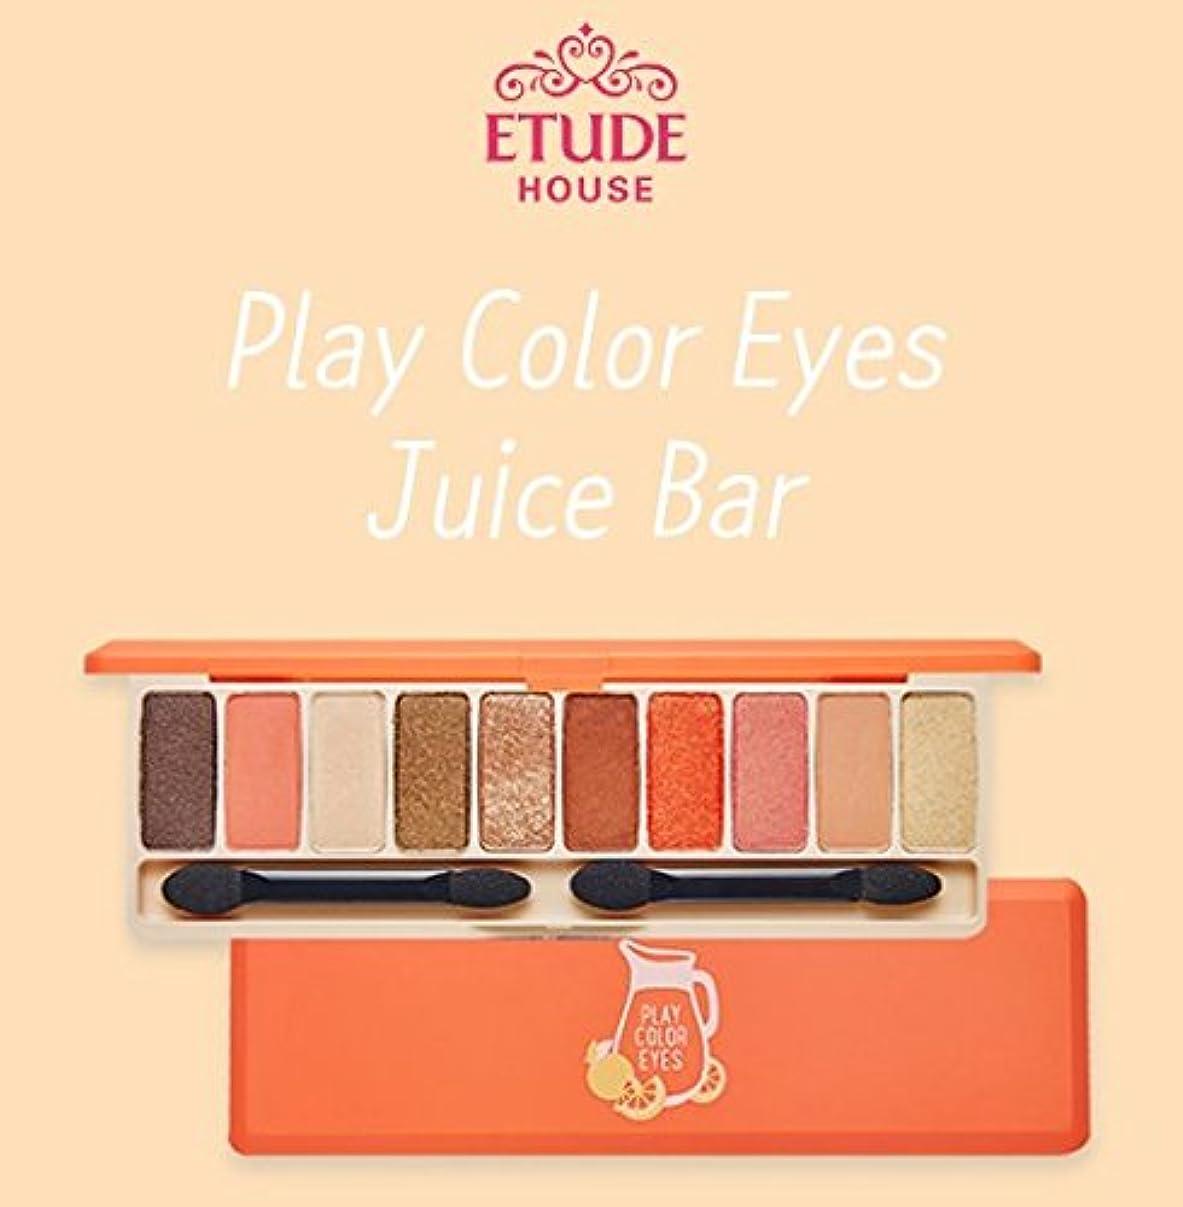 [Etude House] ジュース バー アイシャドウ Play Color Eyes Juice Bar